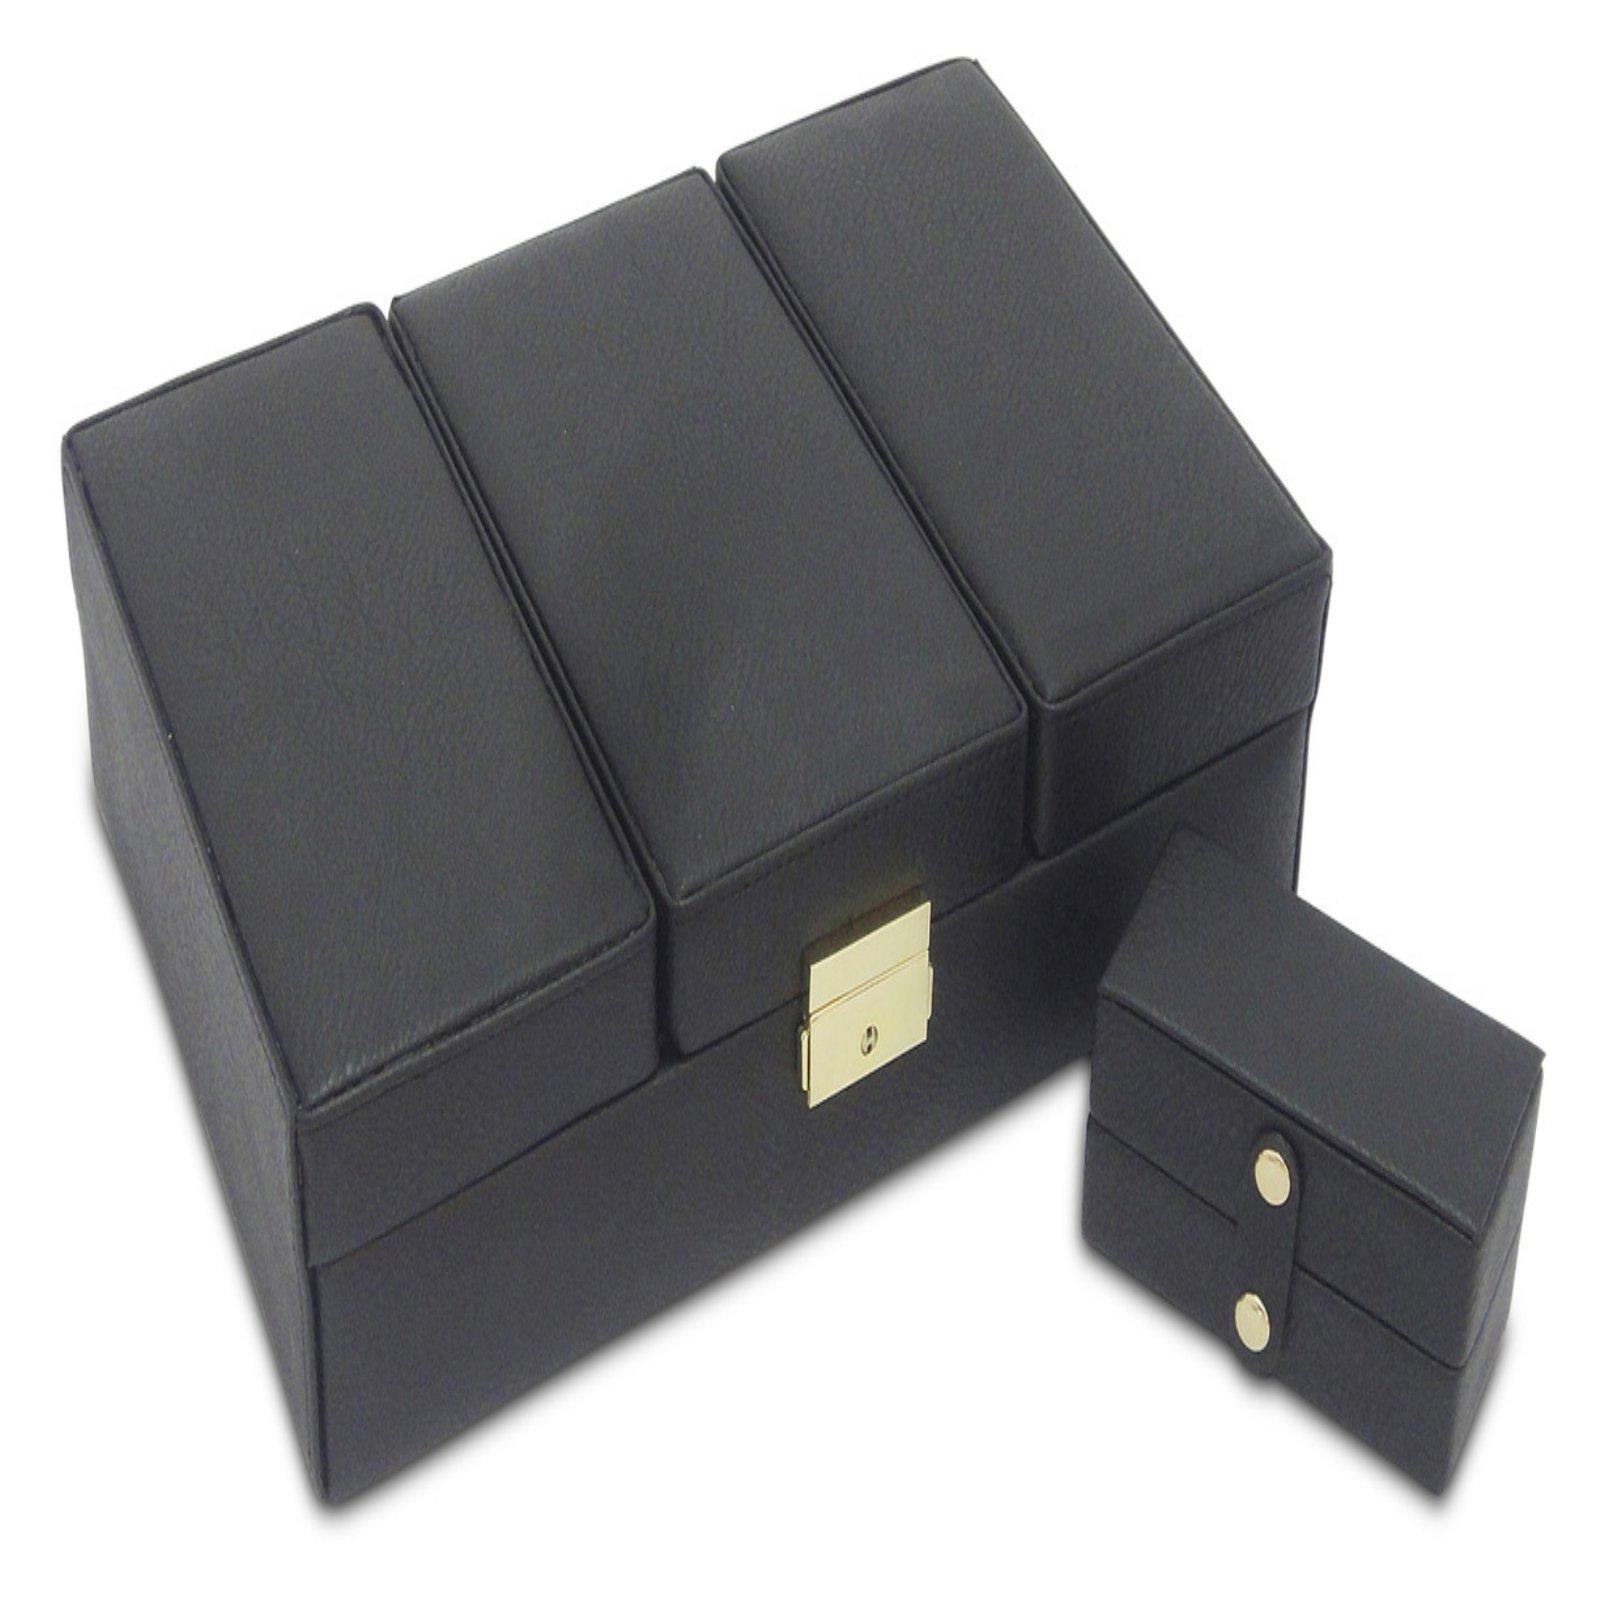 Morelle amp Co Sophia Large Leather Jewelry Box Walmartcom